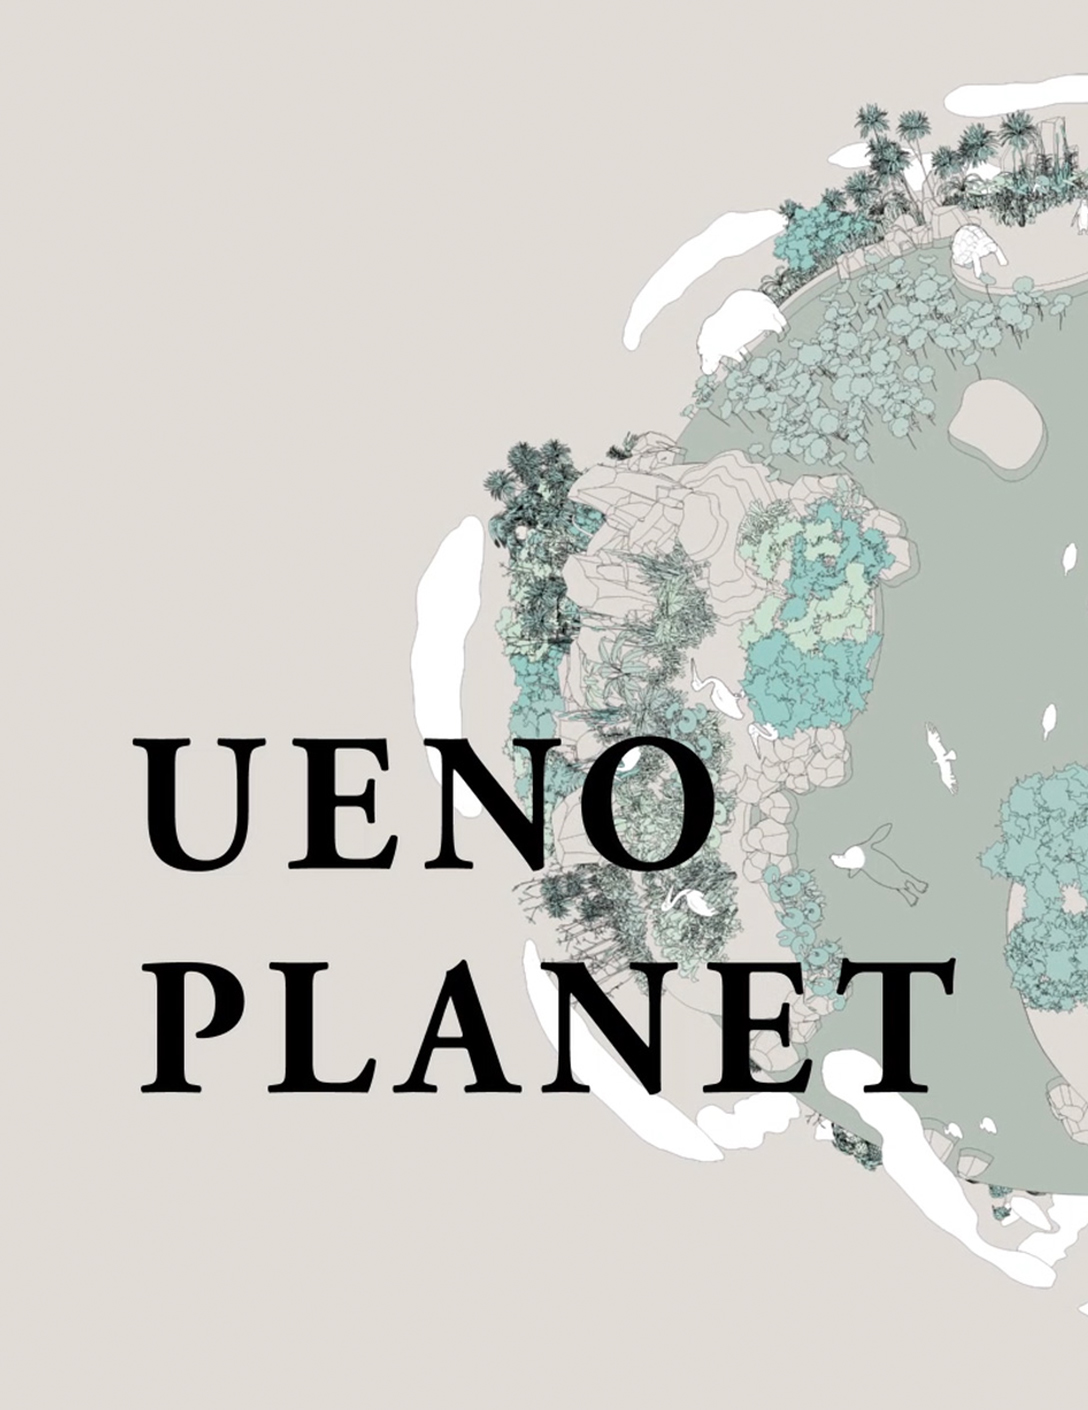 UENO PLANET